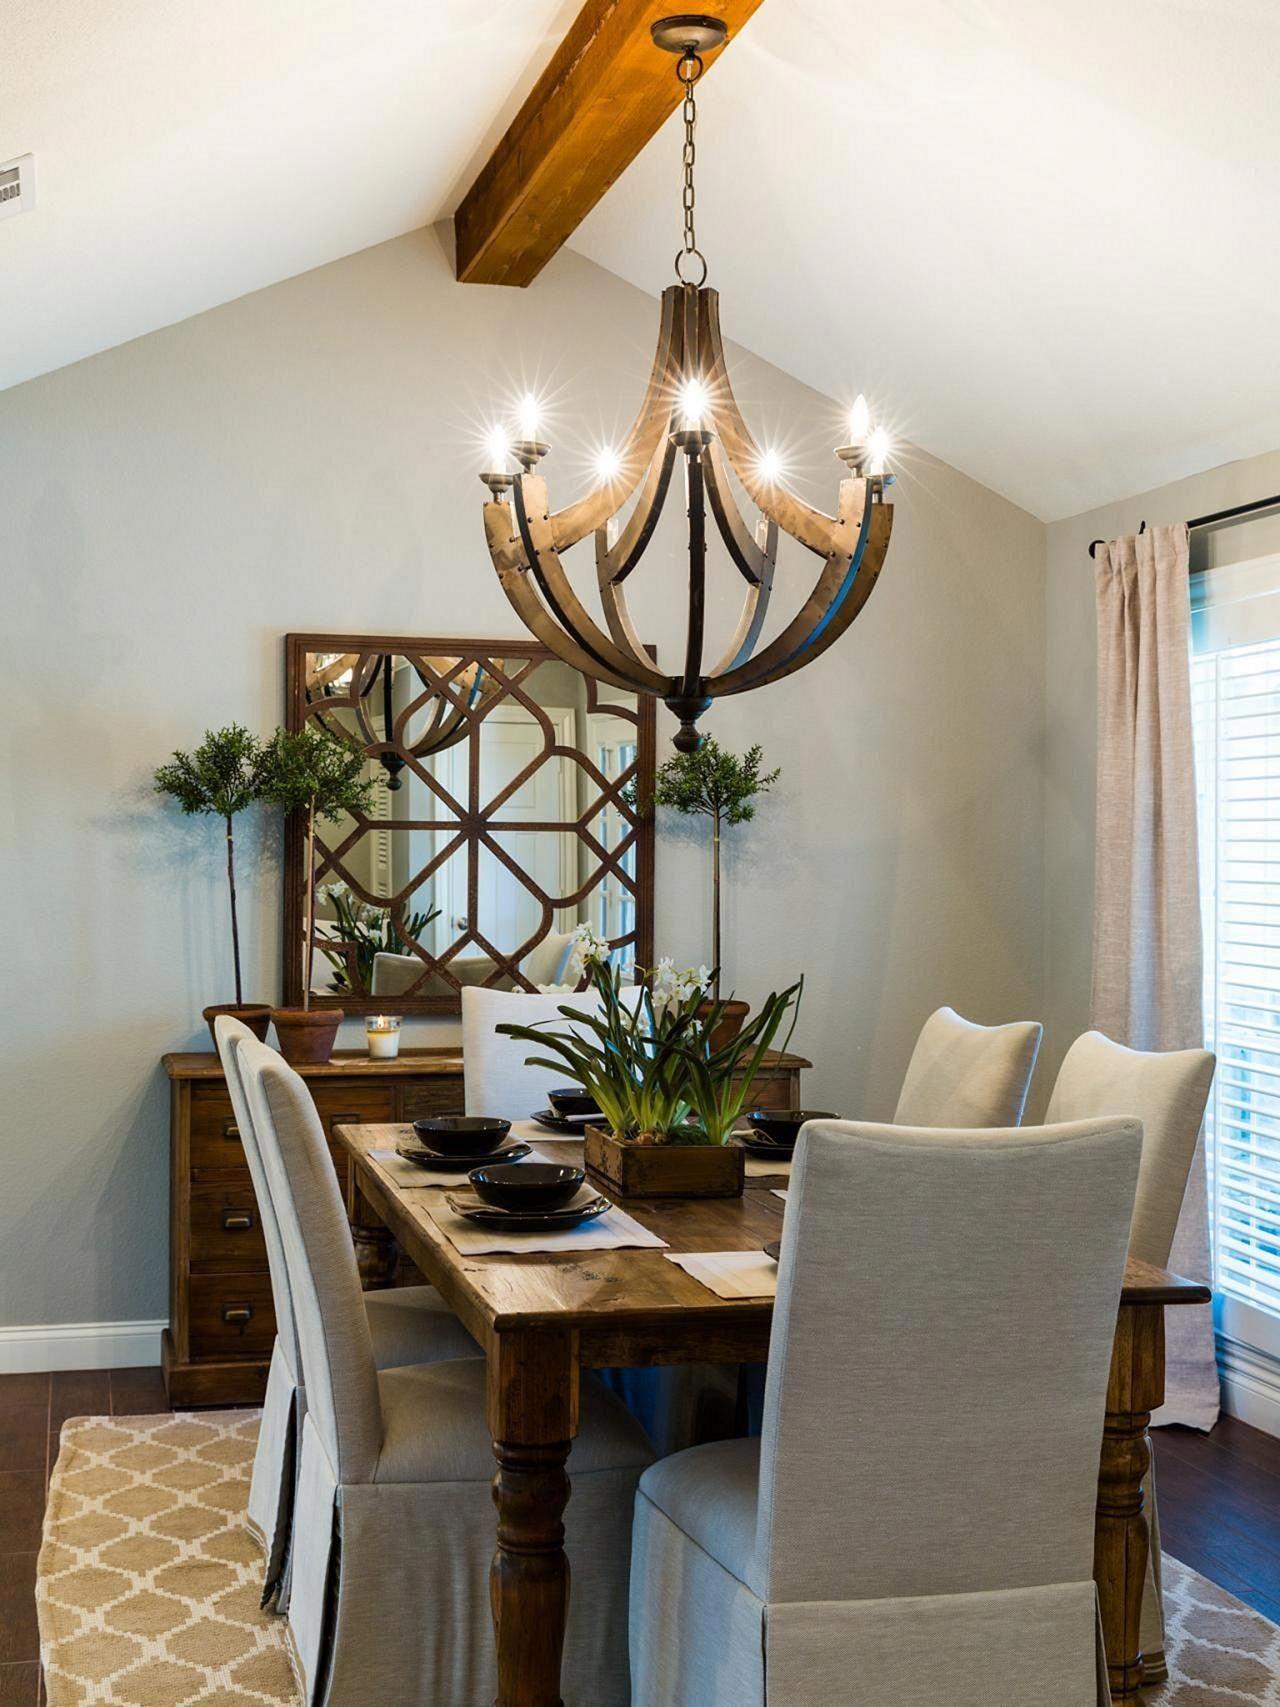 44 Amazing Rustic Dining Room Lighting Ideas Diningroom